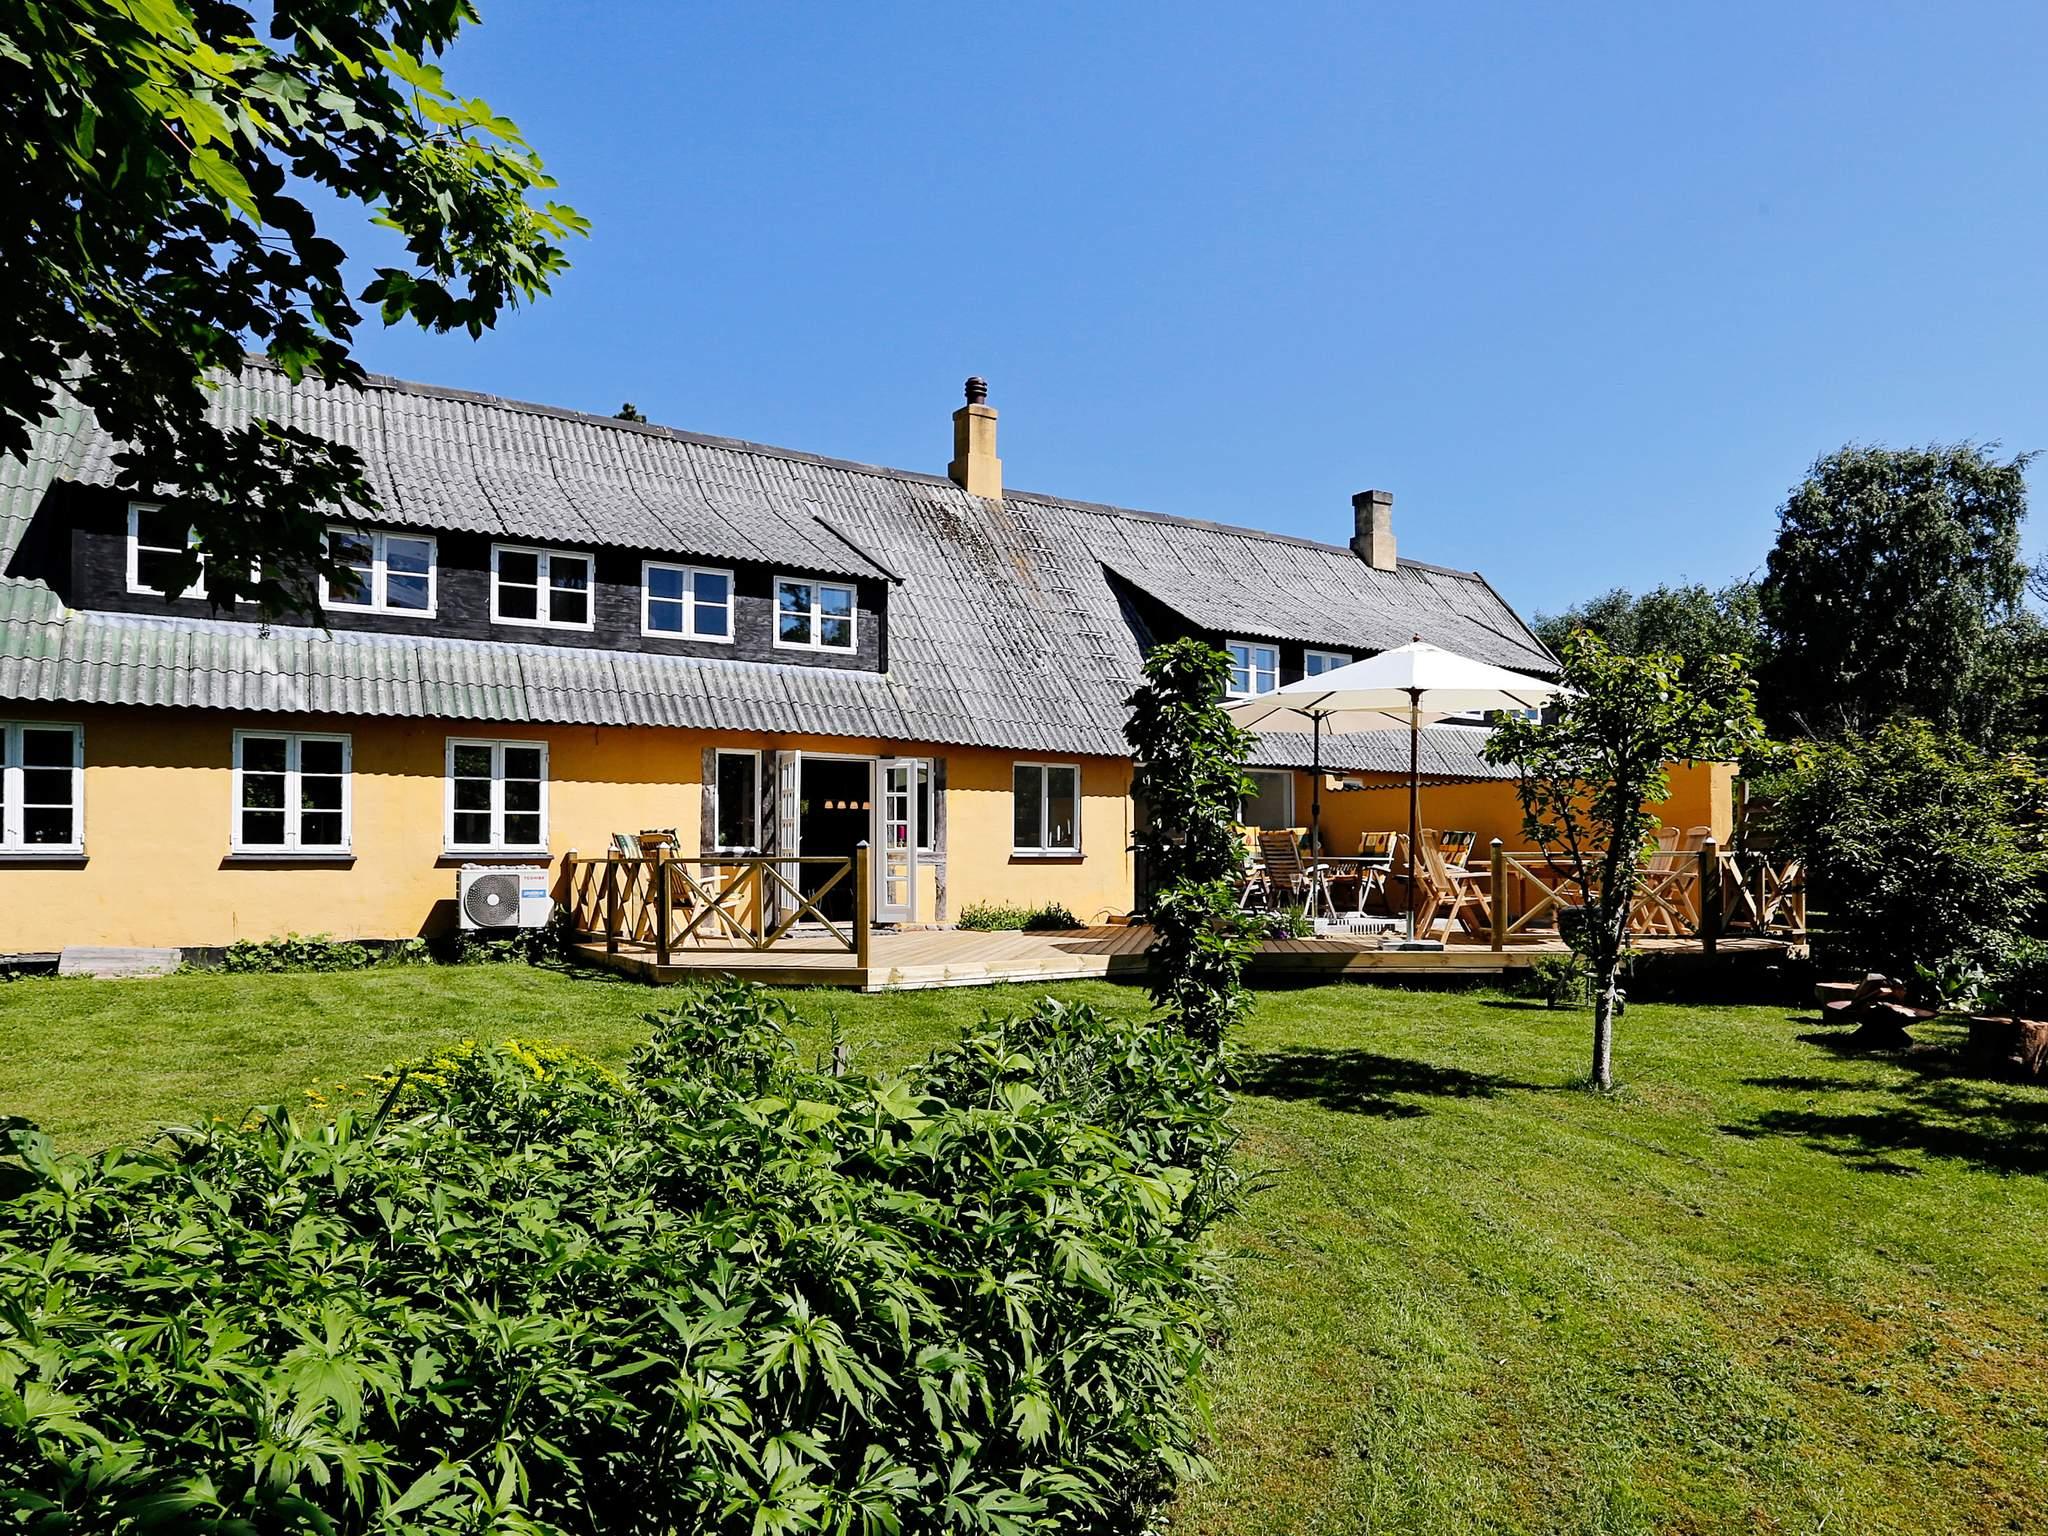 Ferienhaus Vejby Strand (771891), Vejby, , Nordseeland, Dänemark, Bild 22